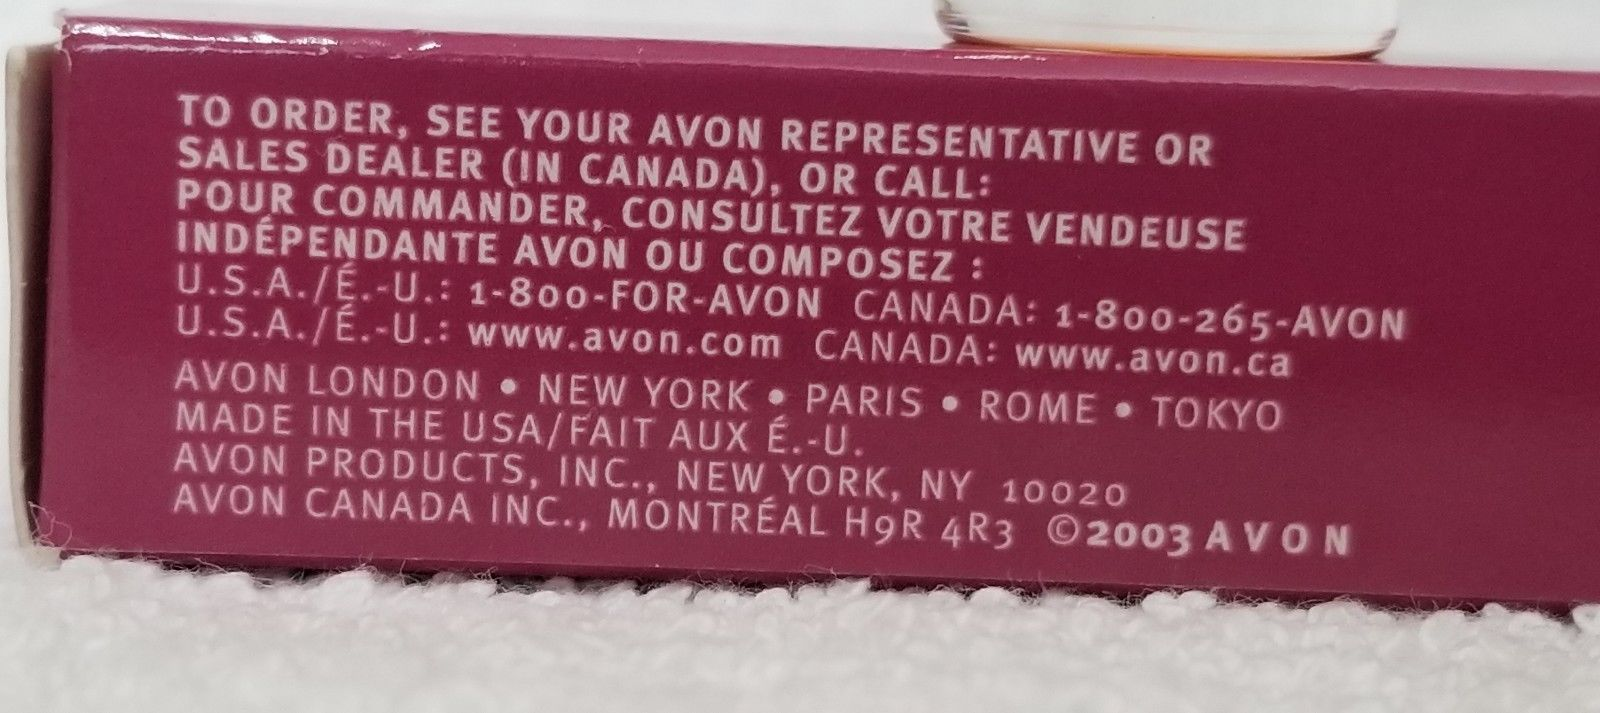 Avon Sweet Sparkle WATERMELON Lip Gloss Sheer Shimmer Rollerball .33 oz/10mL New image 3